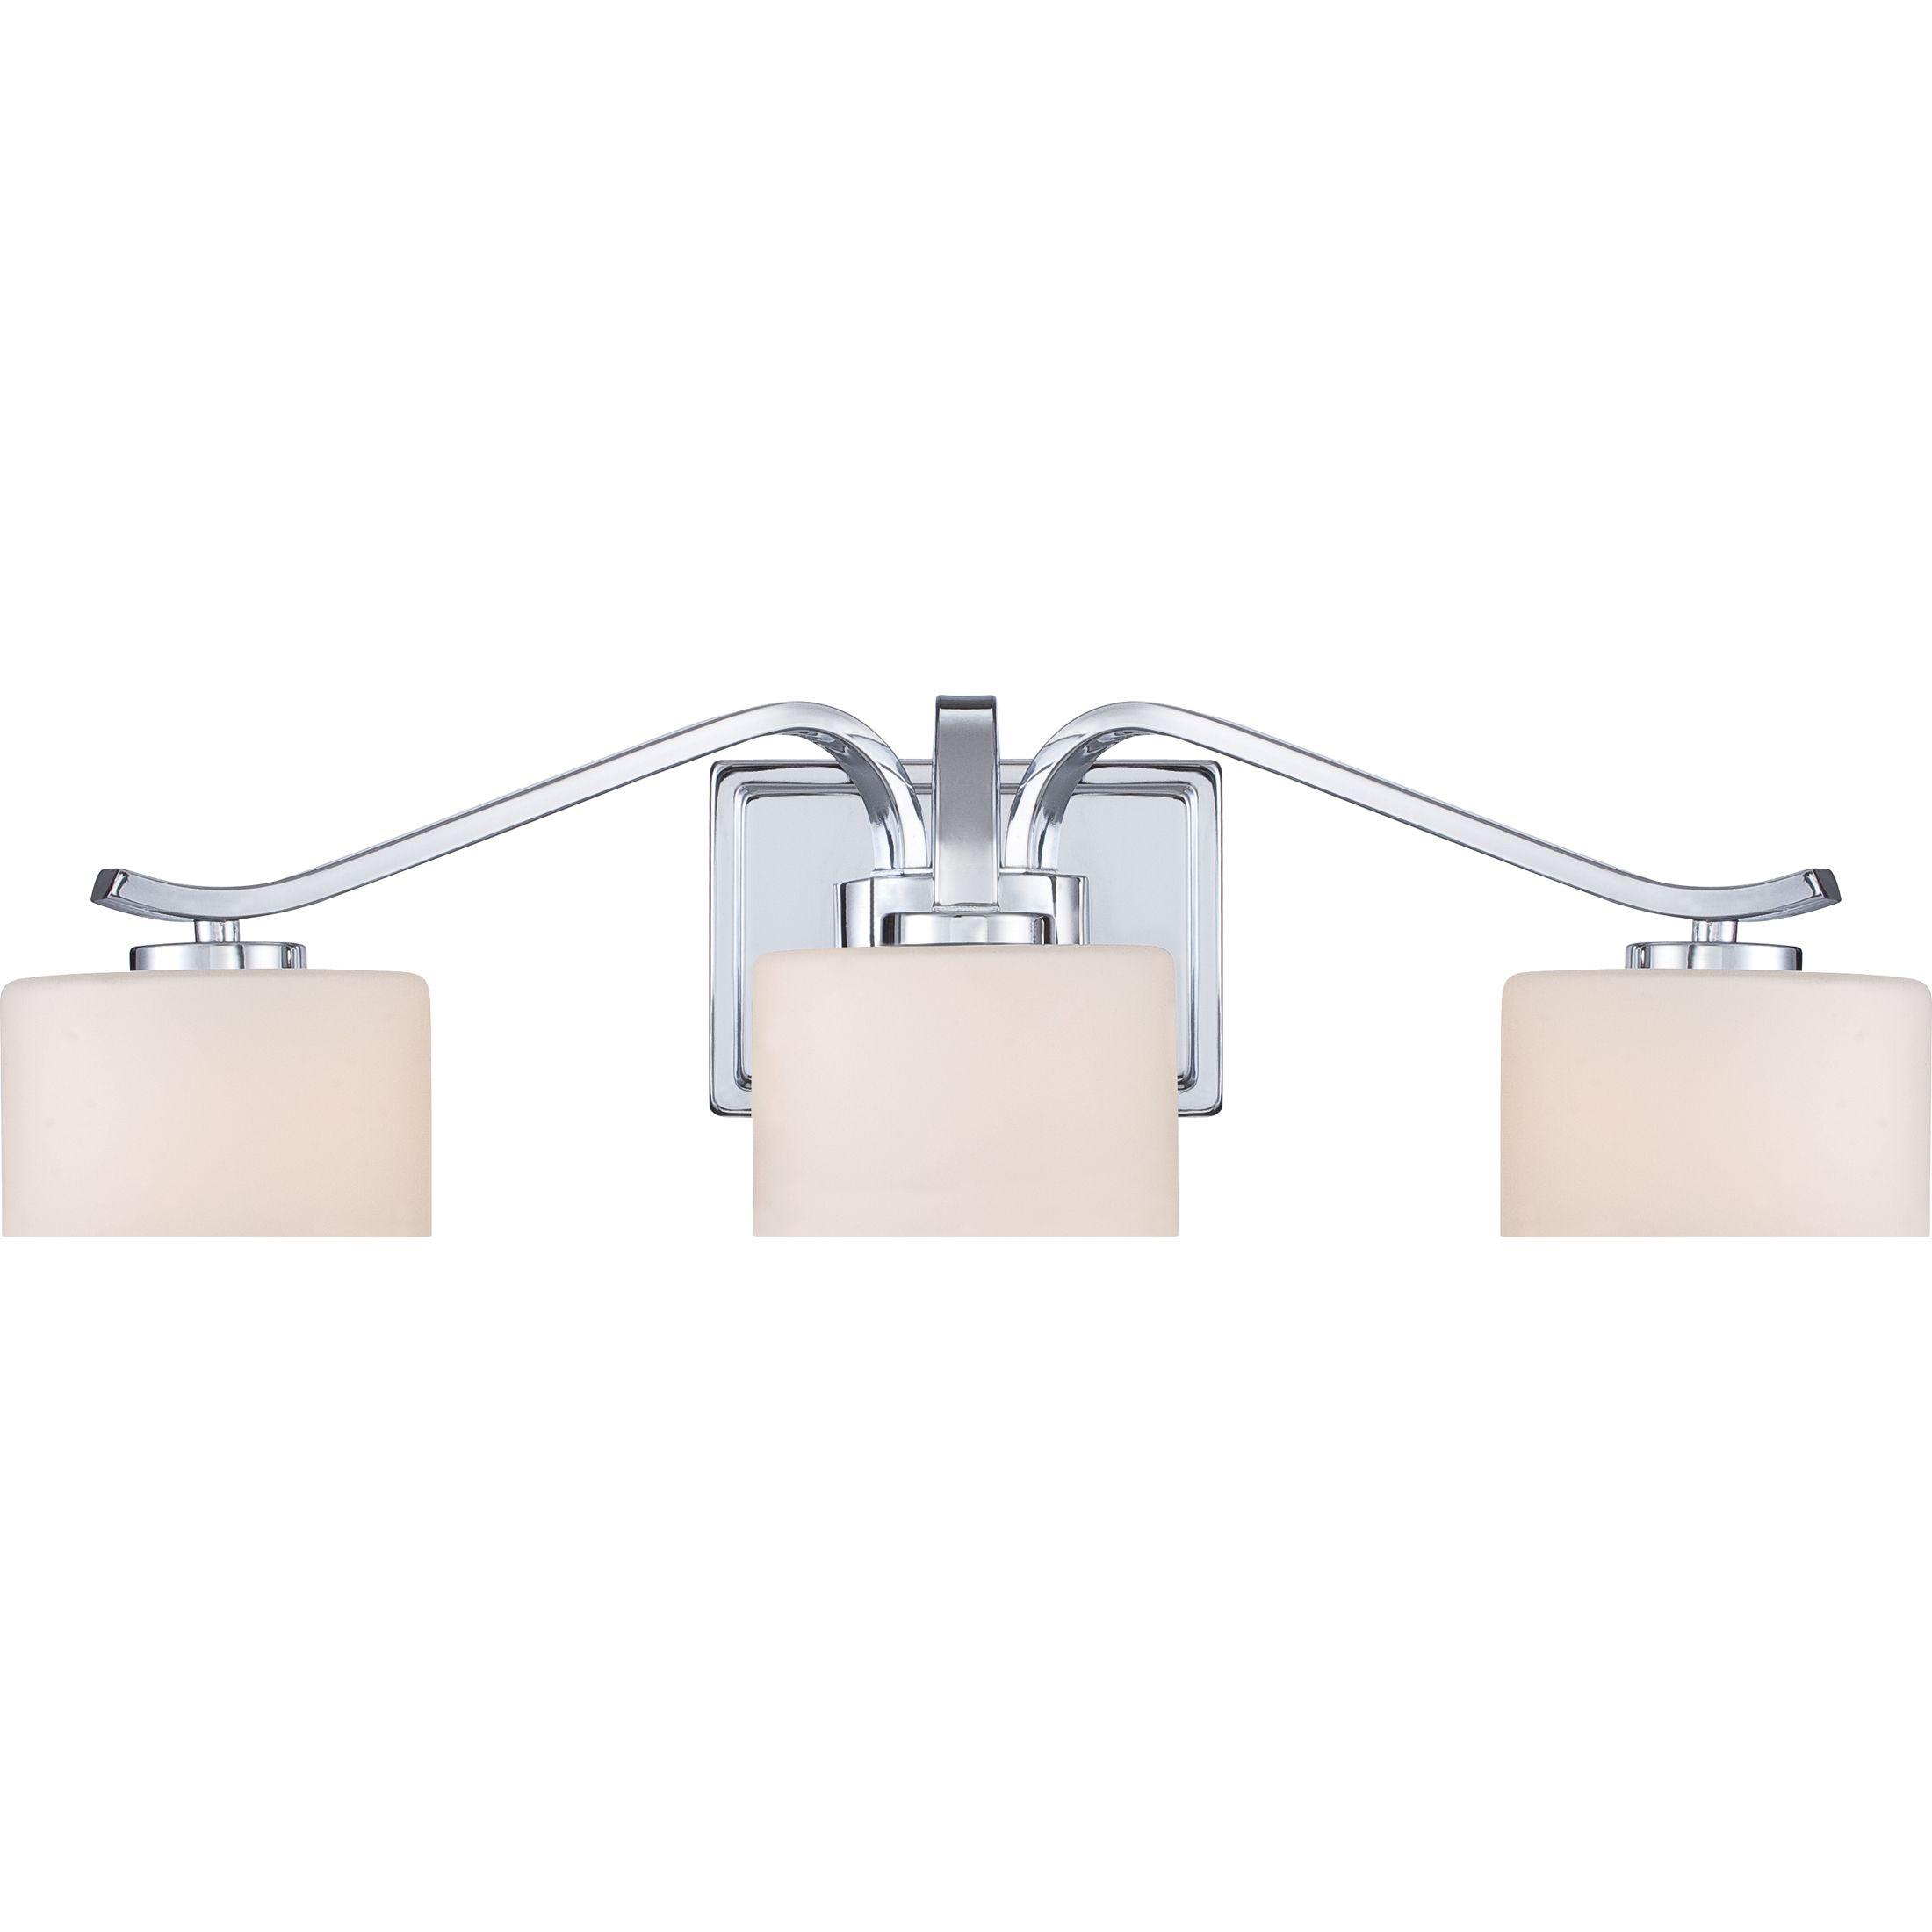 Quoizel Dvn8603c Bath Fixture 3 Lgt Plsh Chrm Bathroom Lighting